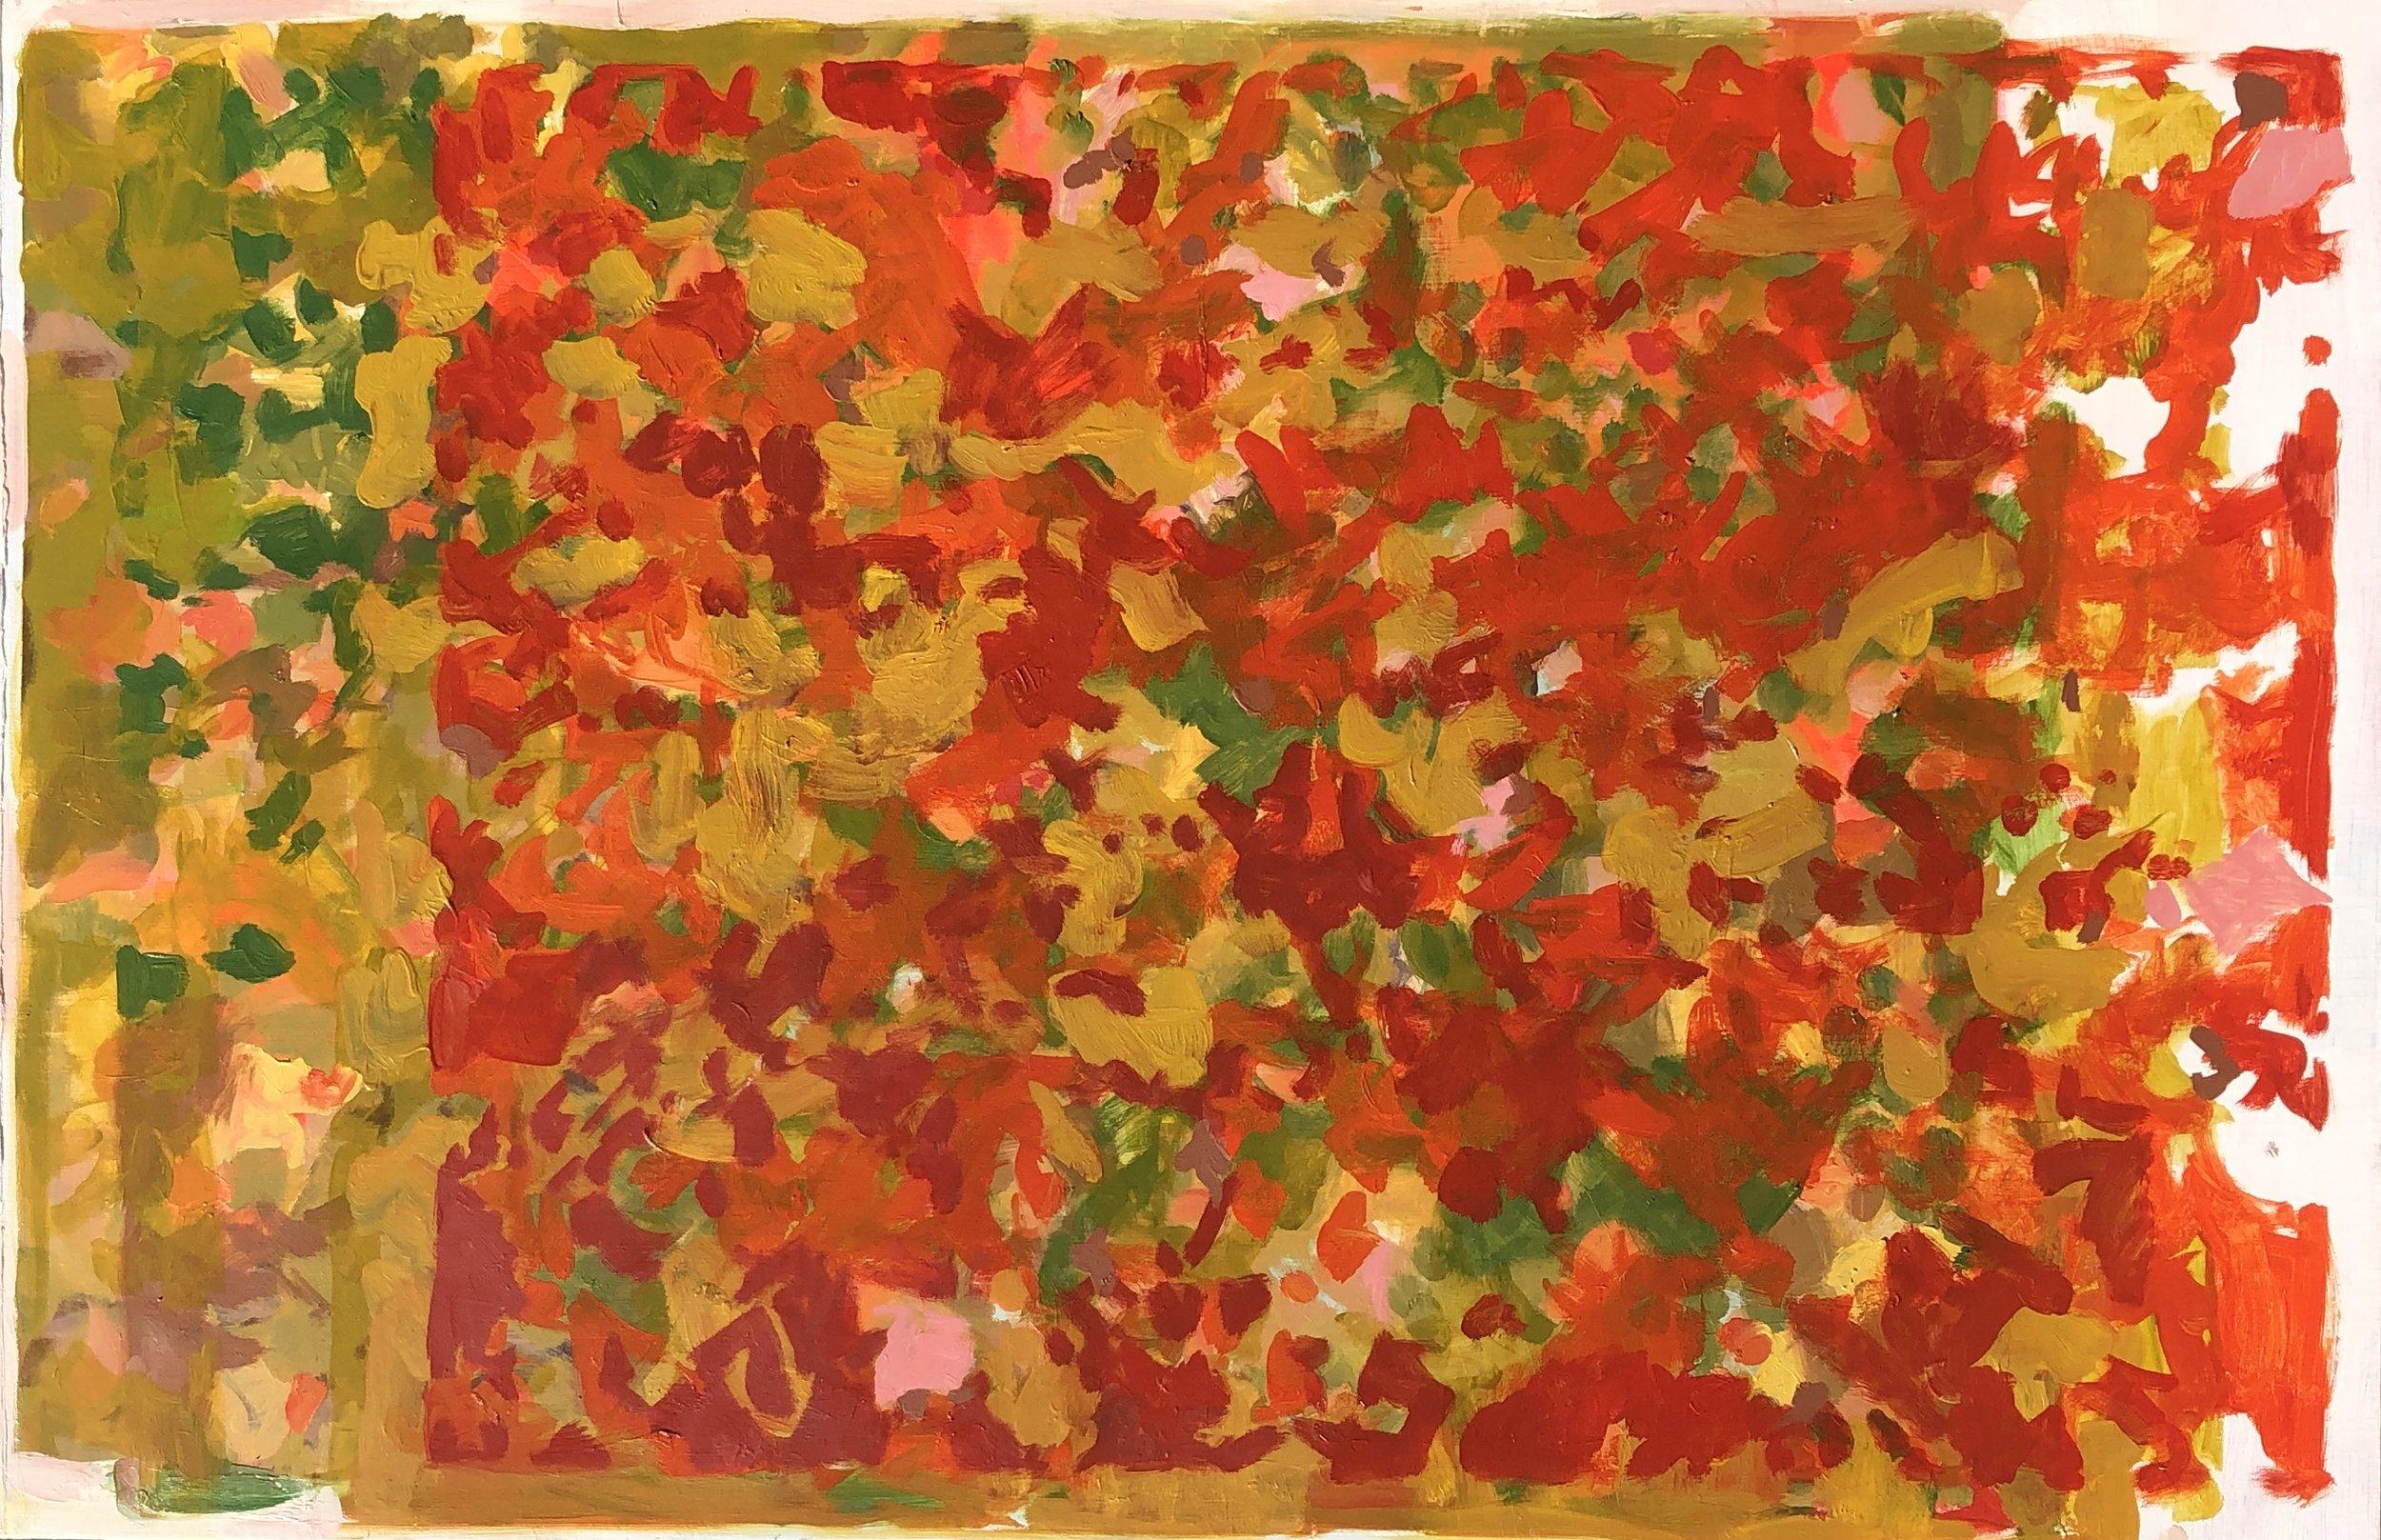 Ground Leaves (34x52)